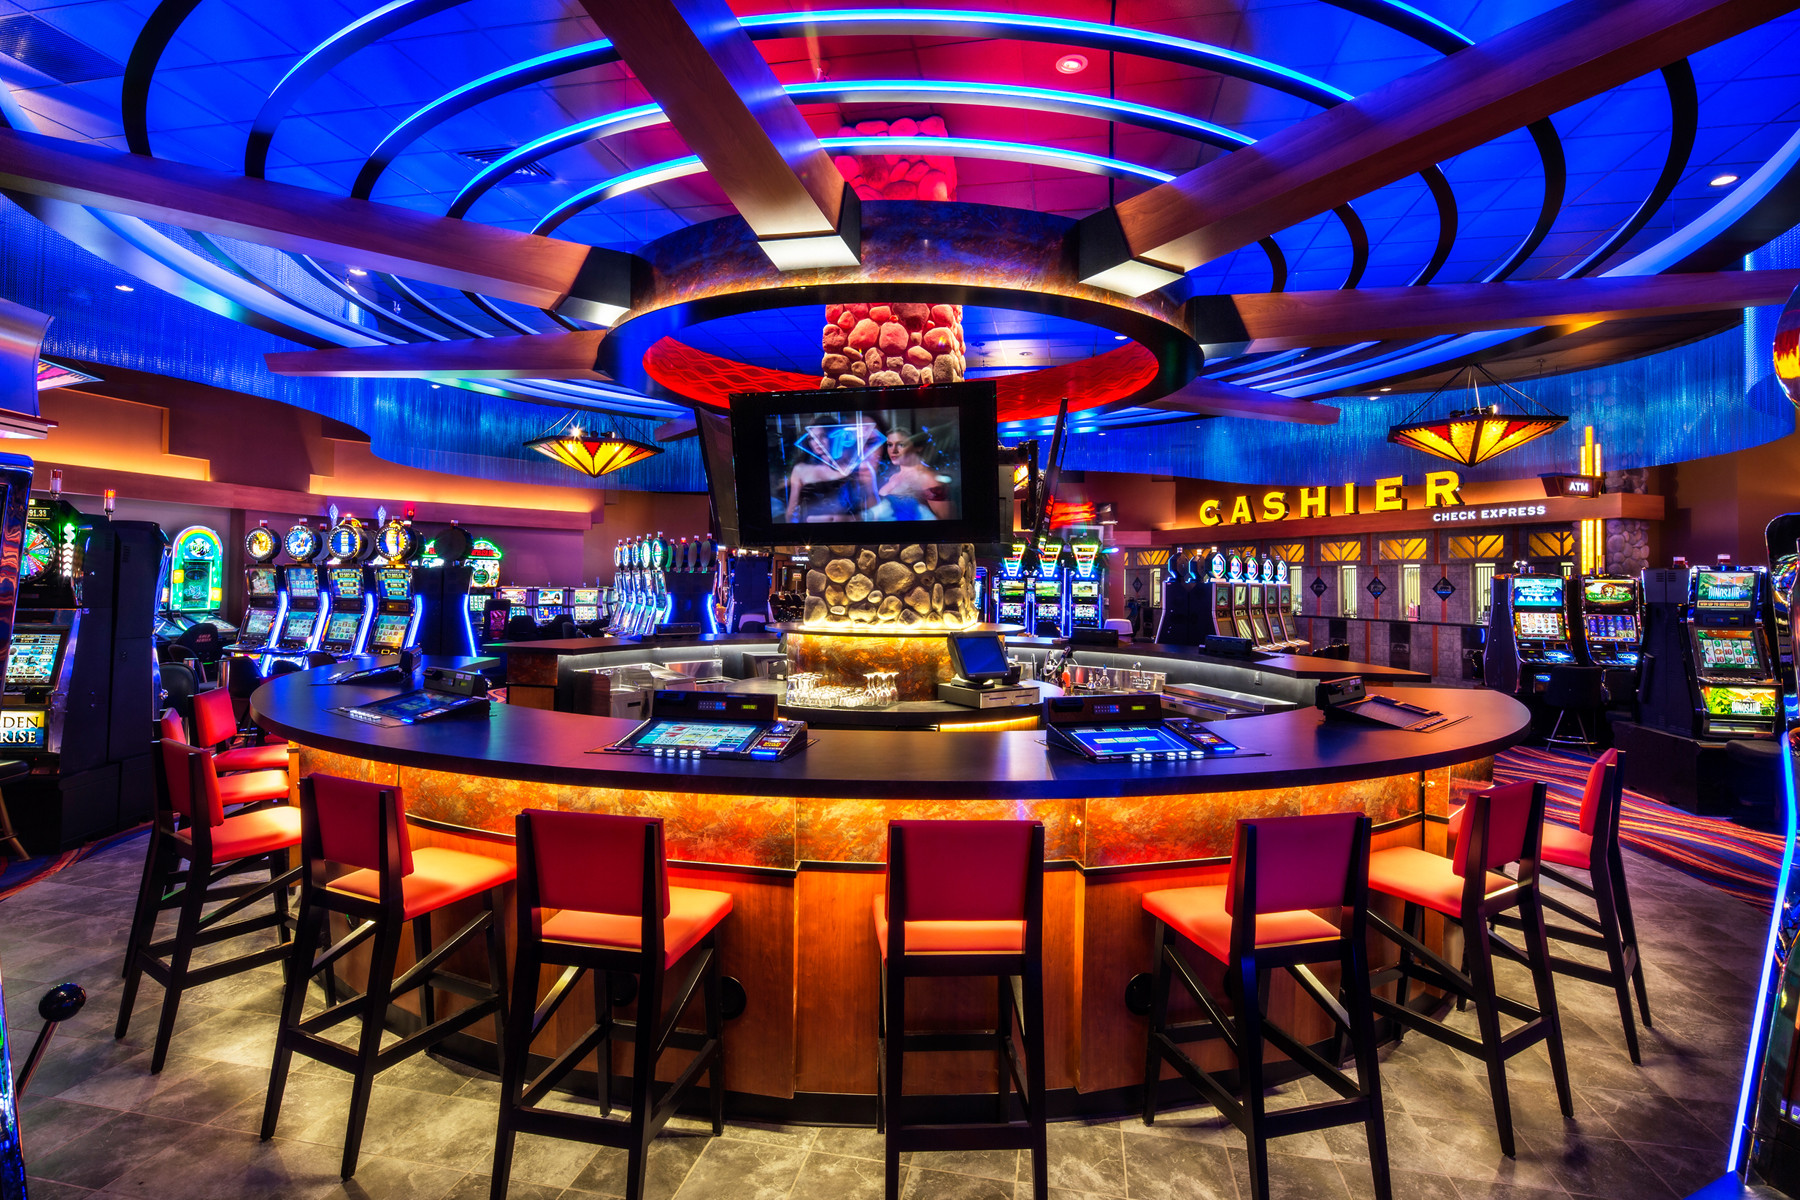 ADA Restroom Trailers for Little Creek Casino Resort